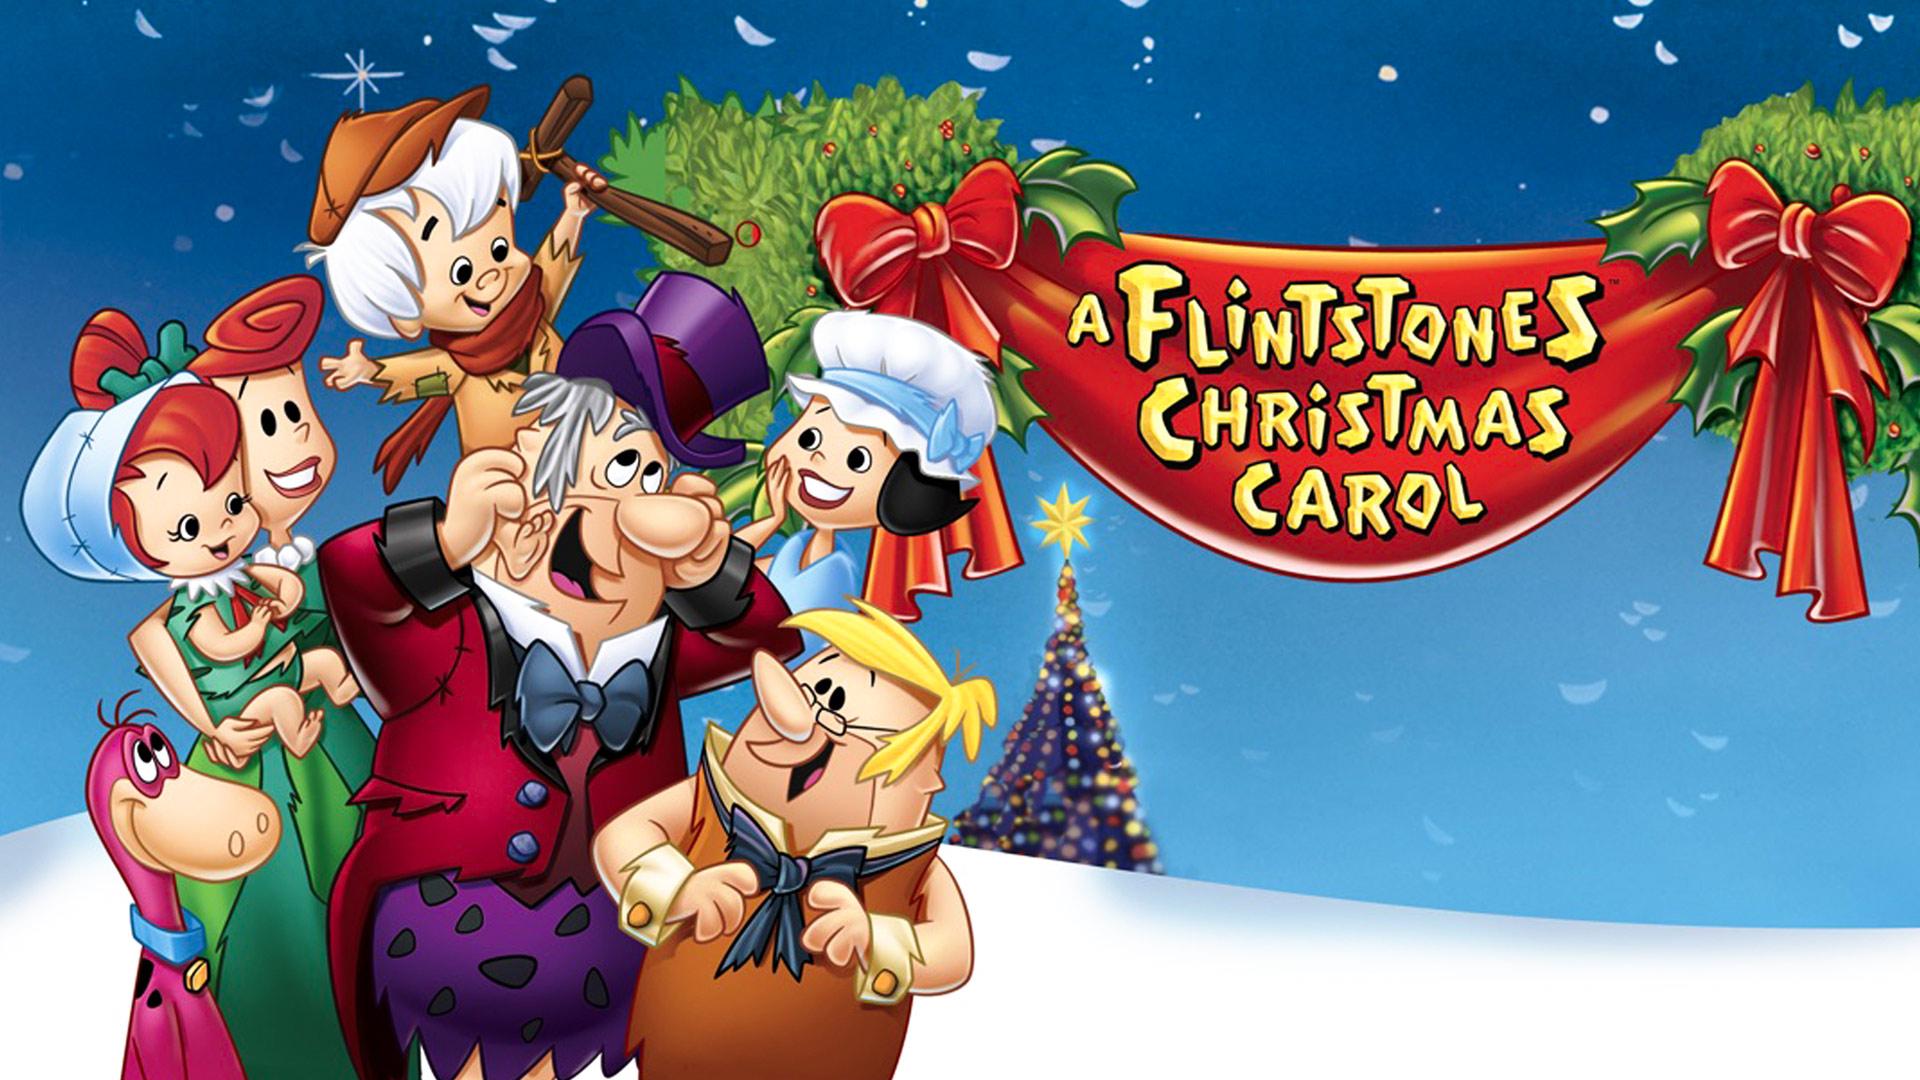 A Flintstone Christmas Carol